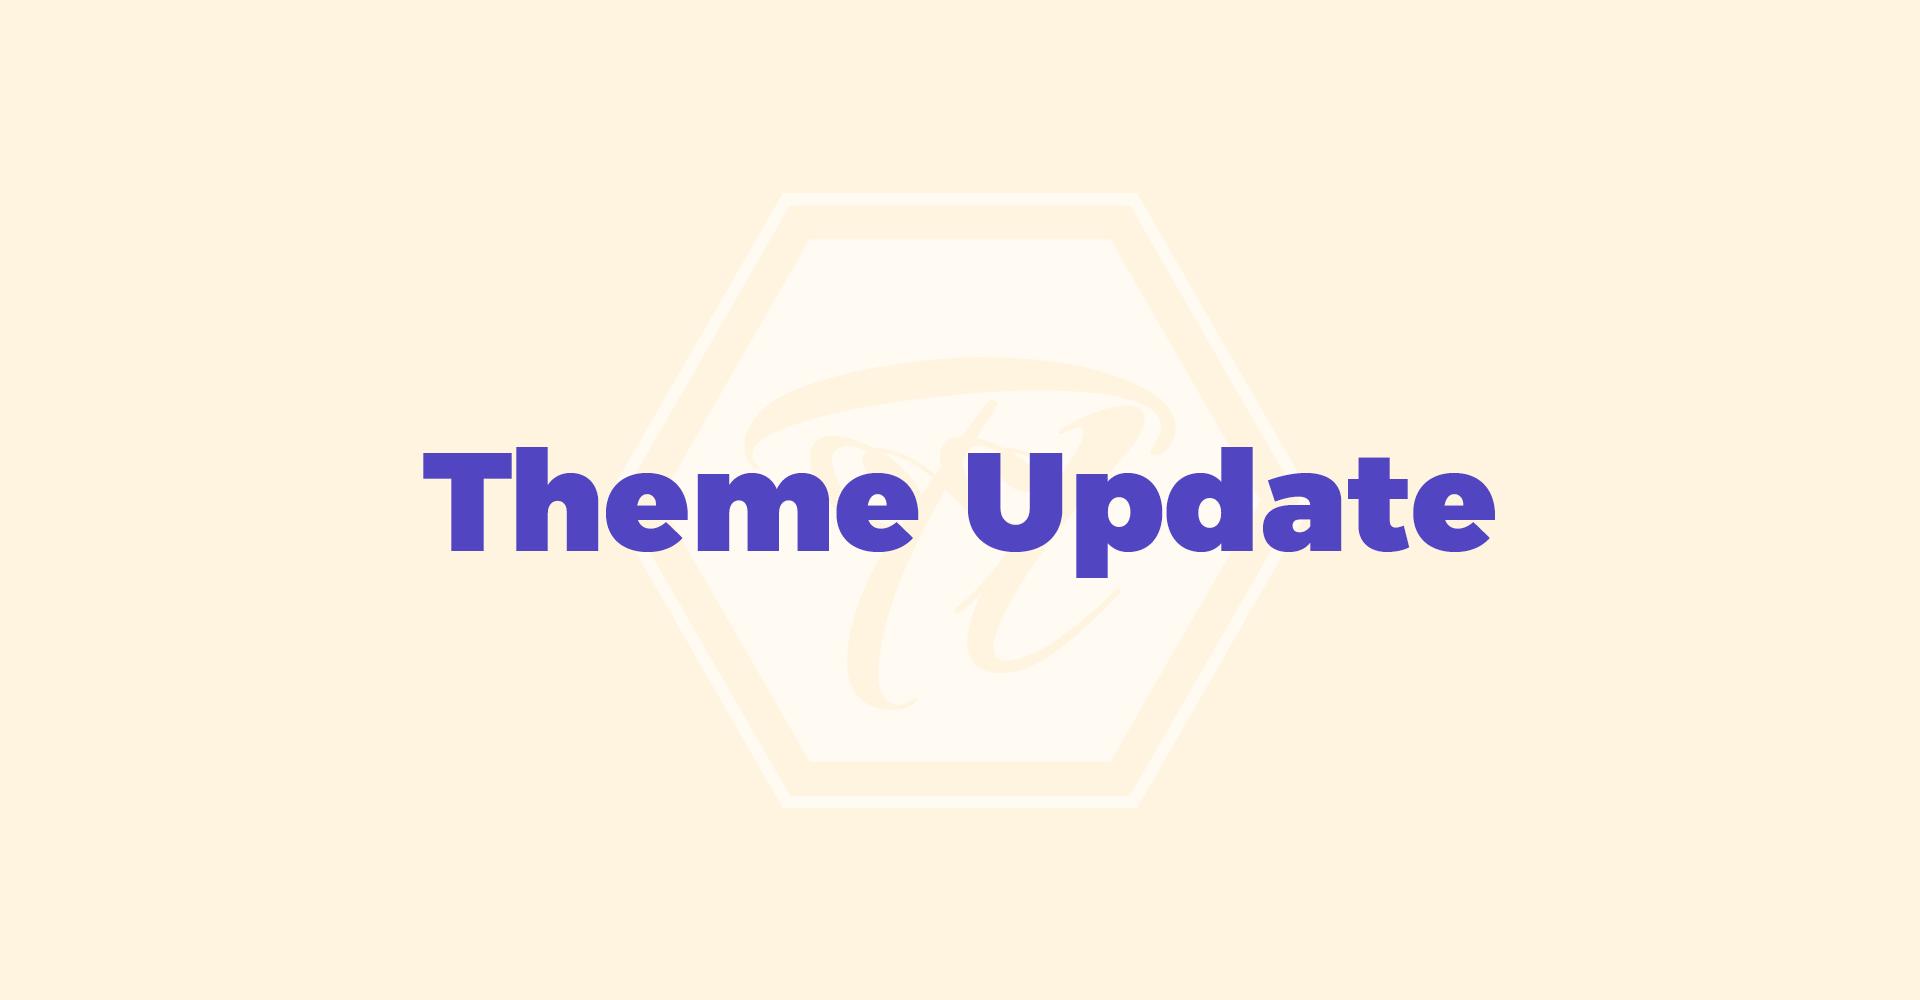 theme_update 4